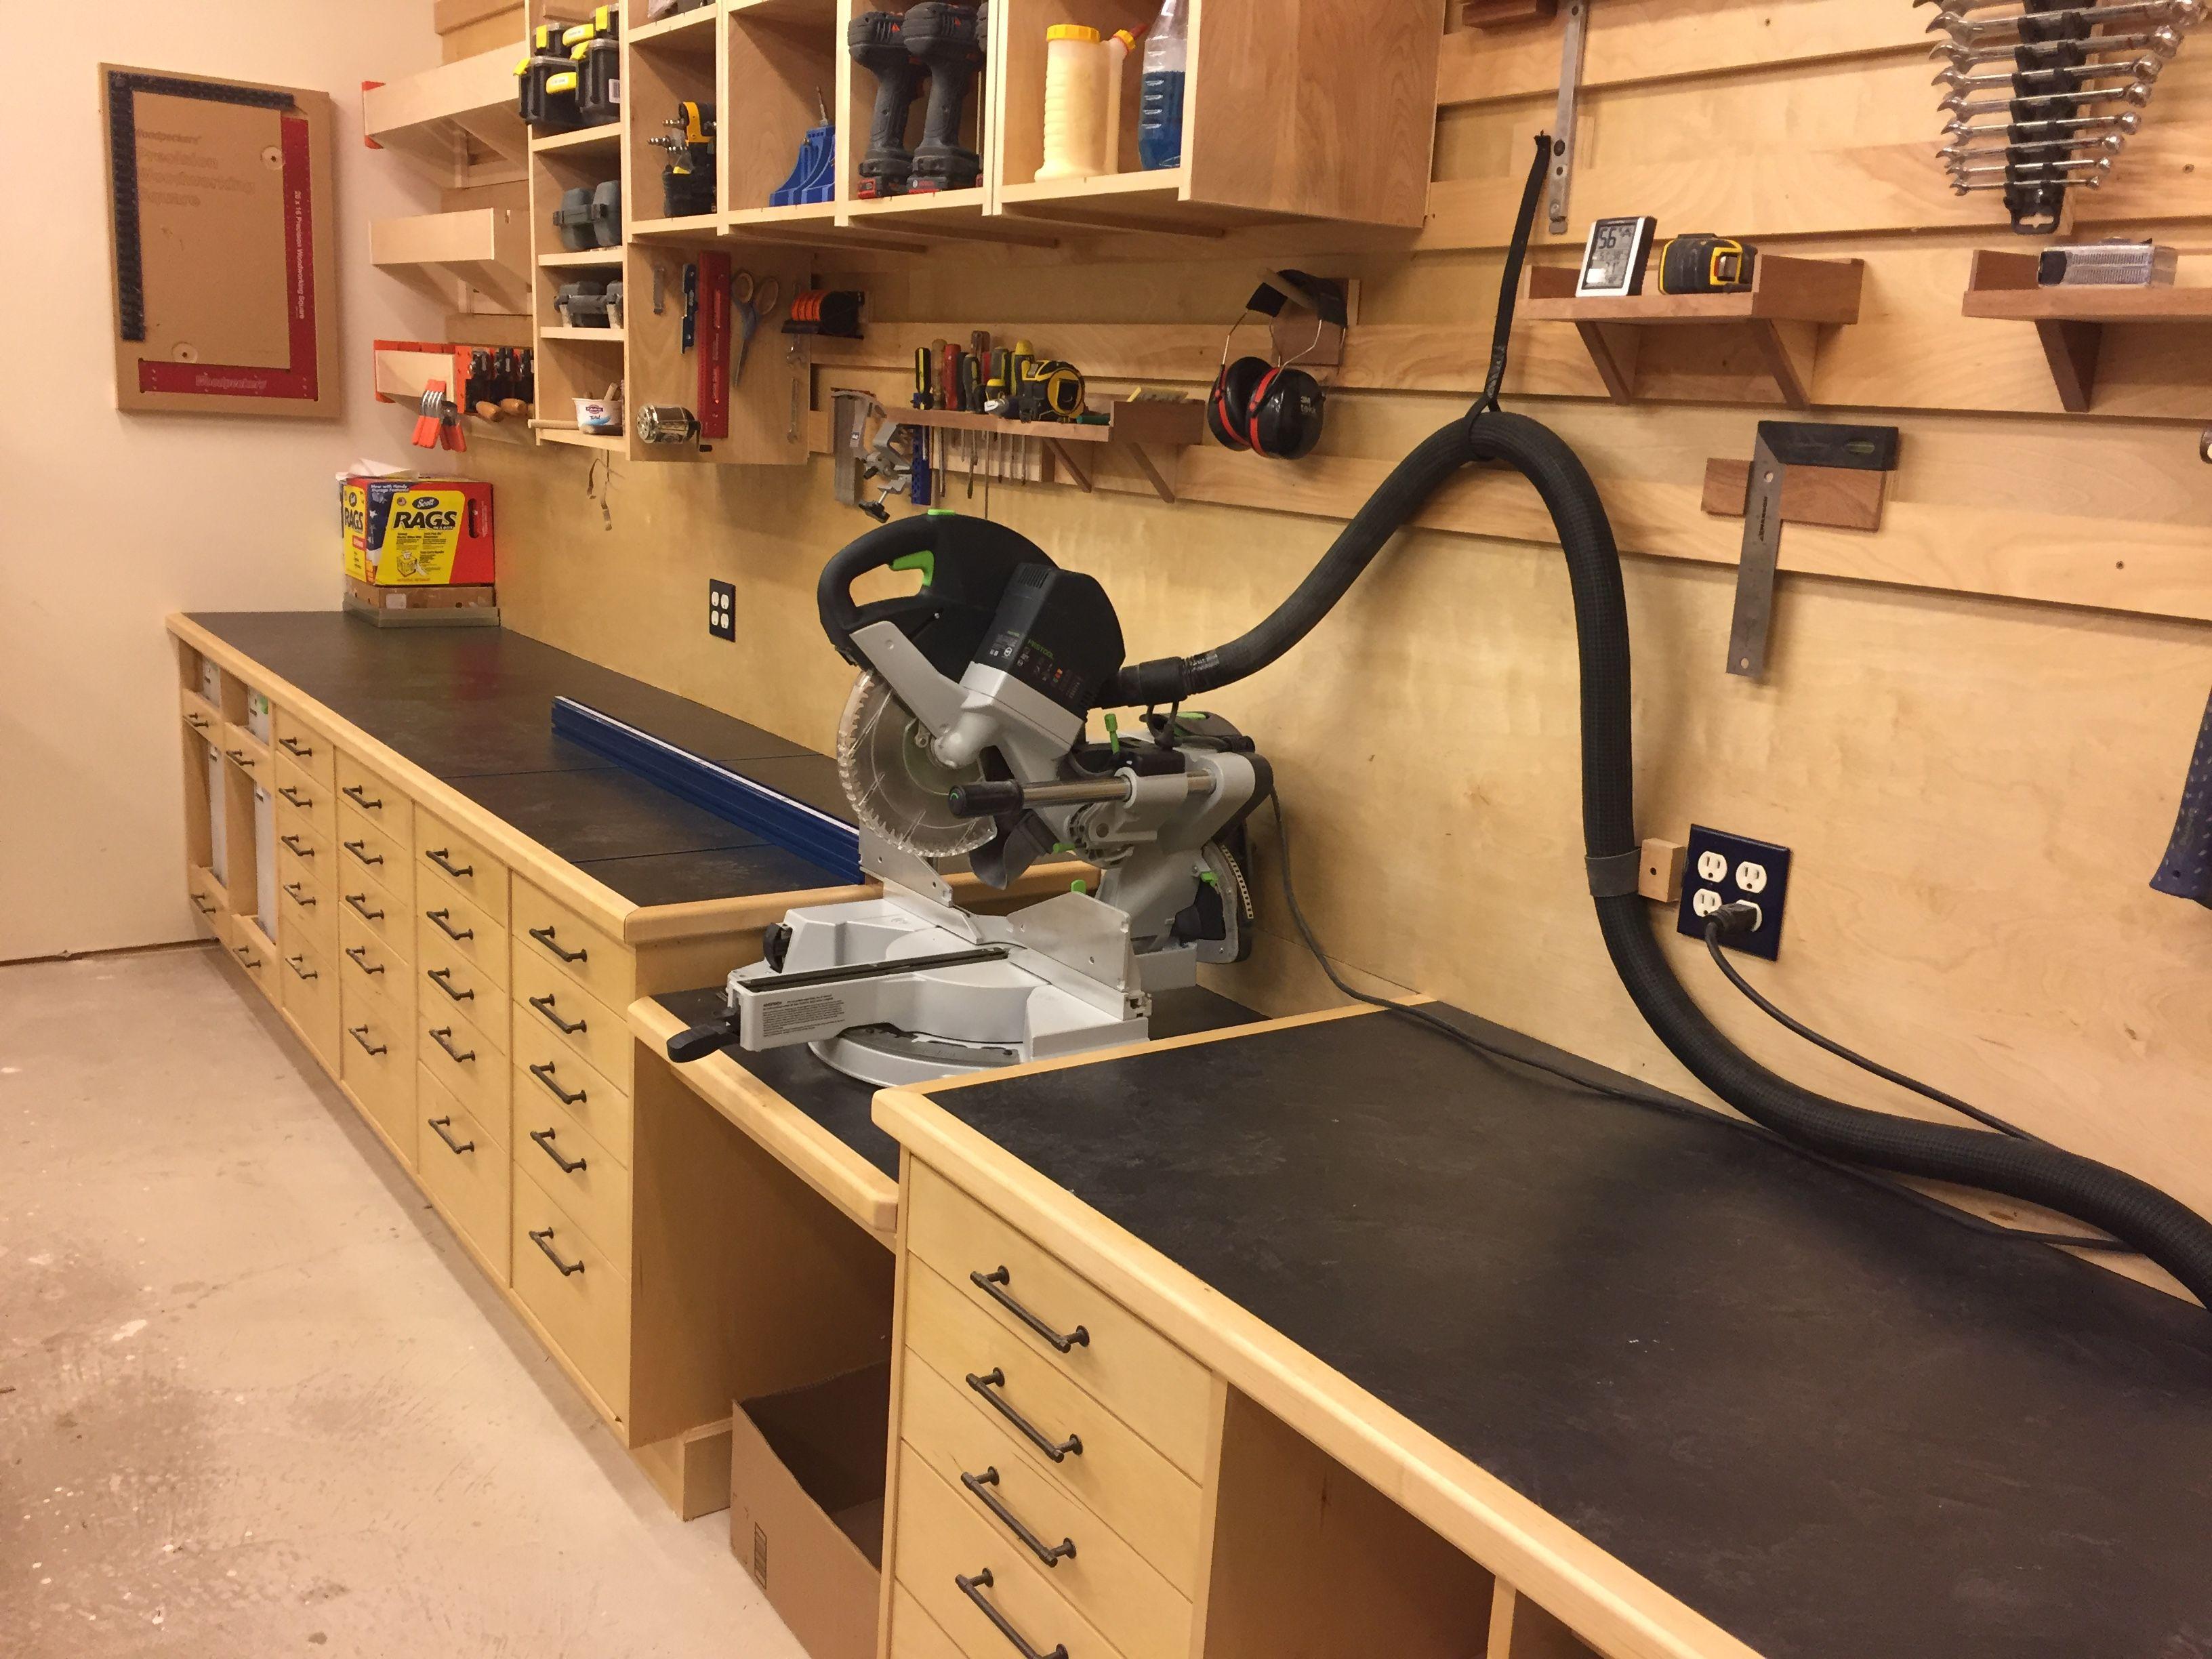 kapex miter saw station woodworking shop layout on top 55 best garage workshop ideas basics of garage workshop ideas explained id=78524